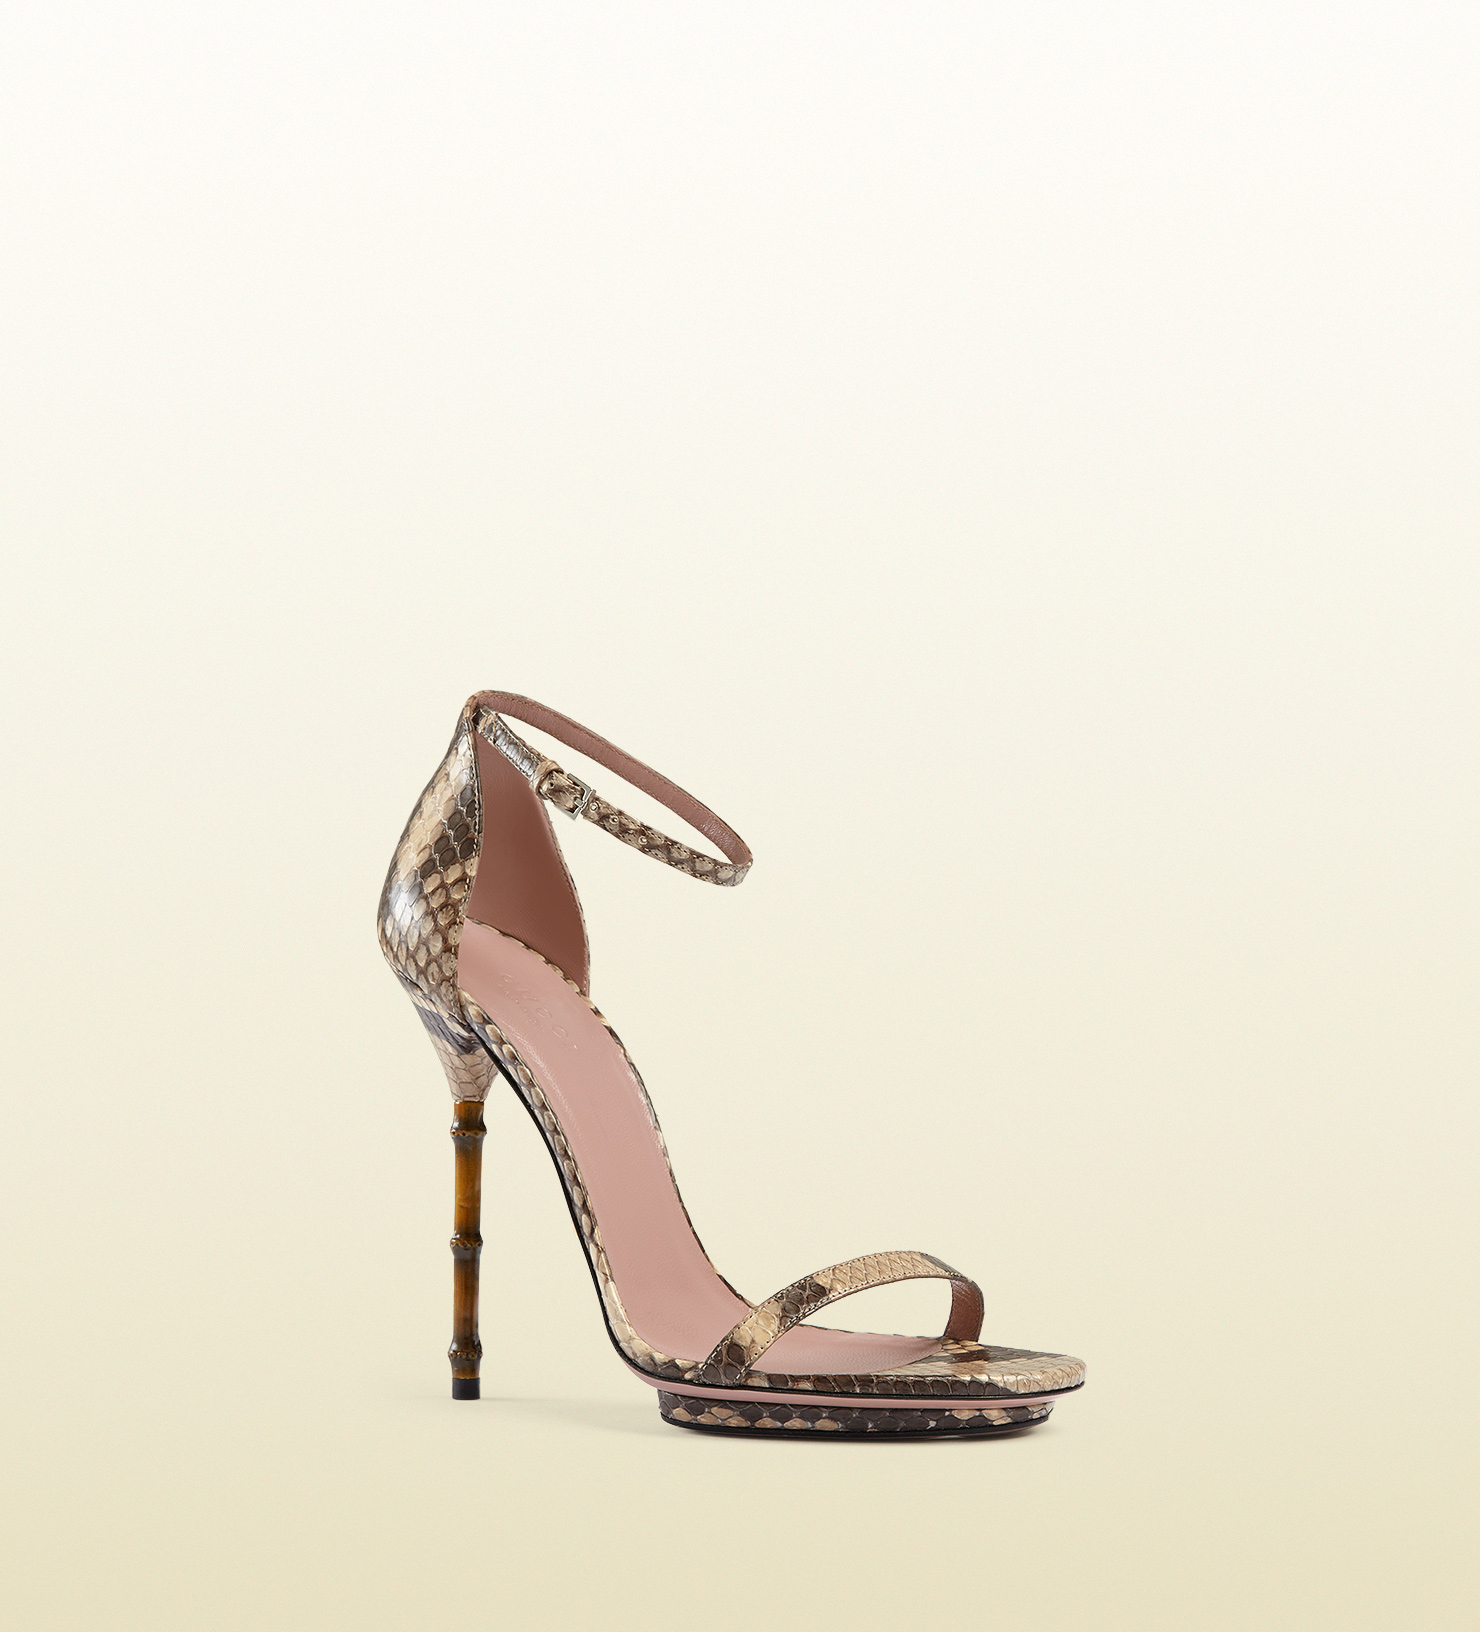 aff30b4ebc5 Lyst - Gucci Python Sandal With Bamboo Shaped Heel